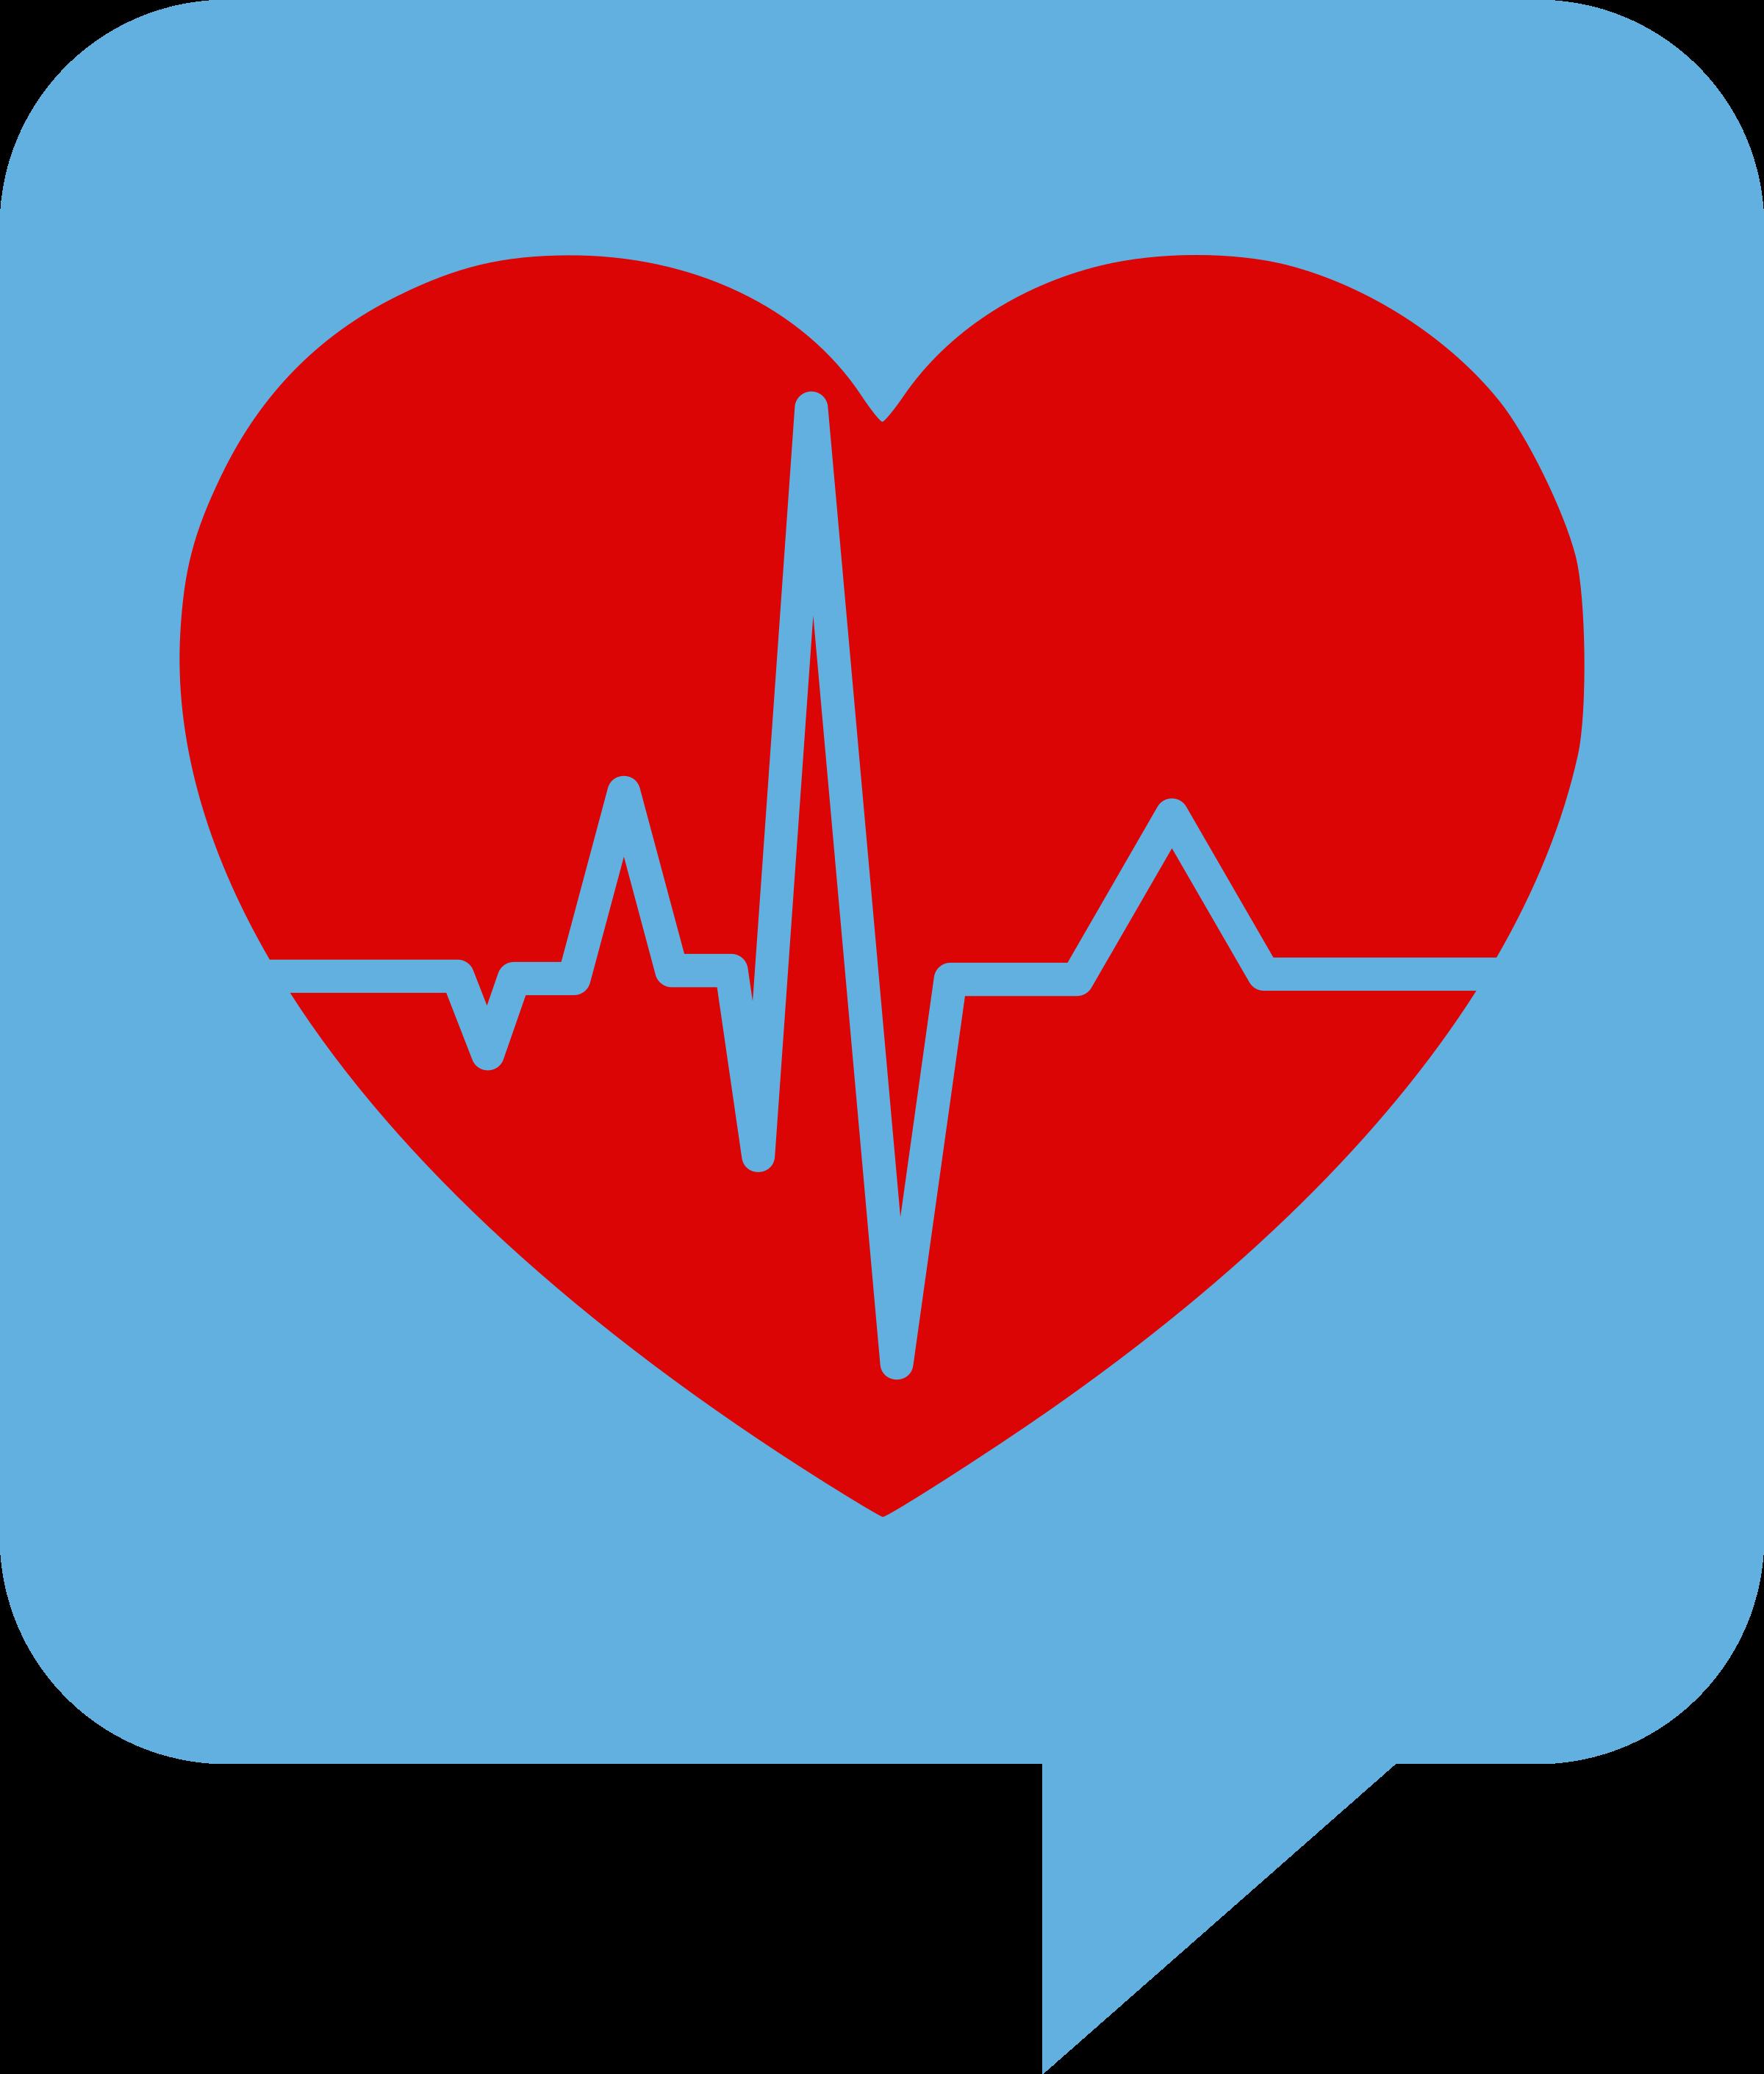 Health clipart health symbol. Heartbeat logo for se